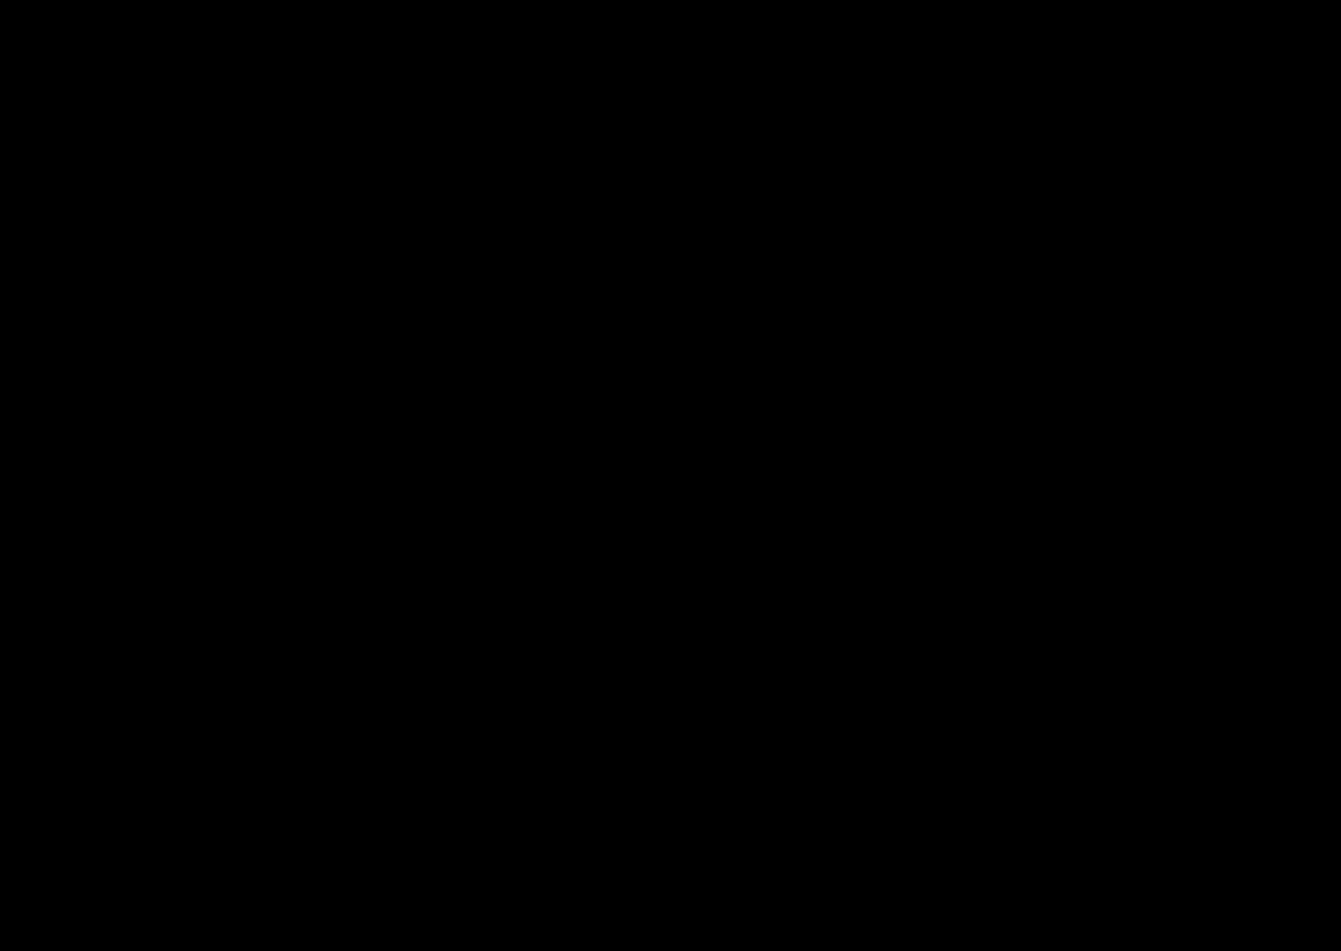 (2-Hydroxypropyl)--cyclodextrin (Technical Grade)